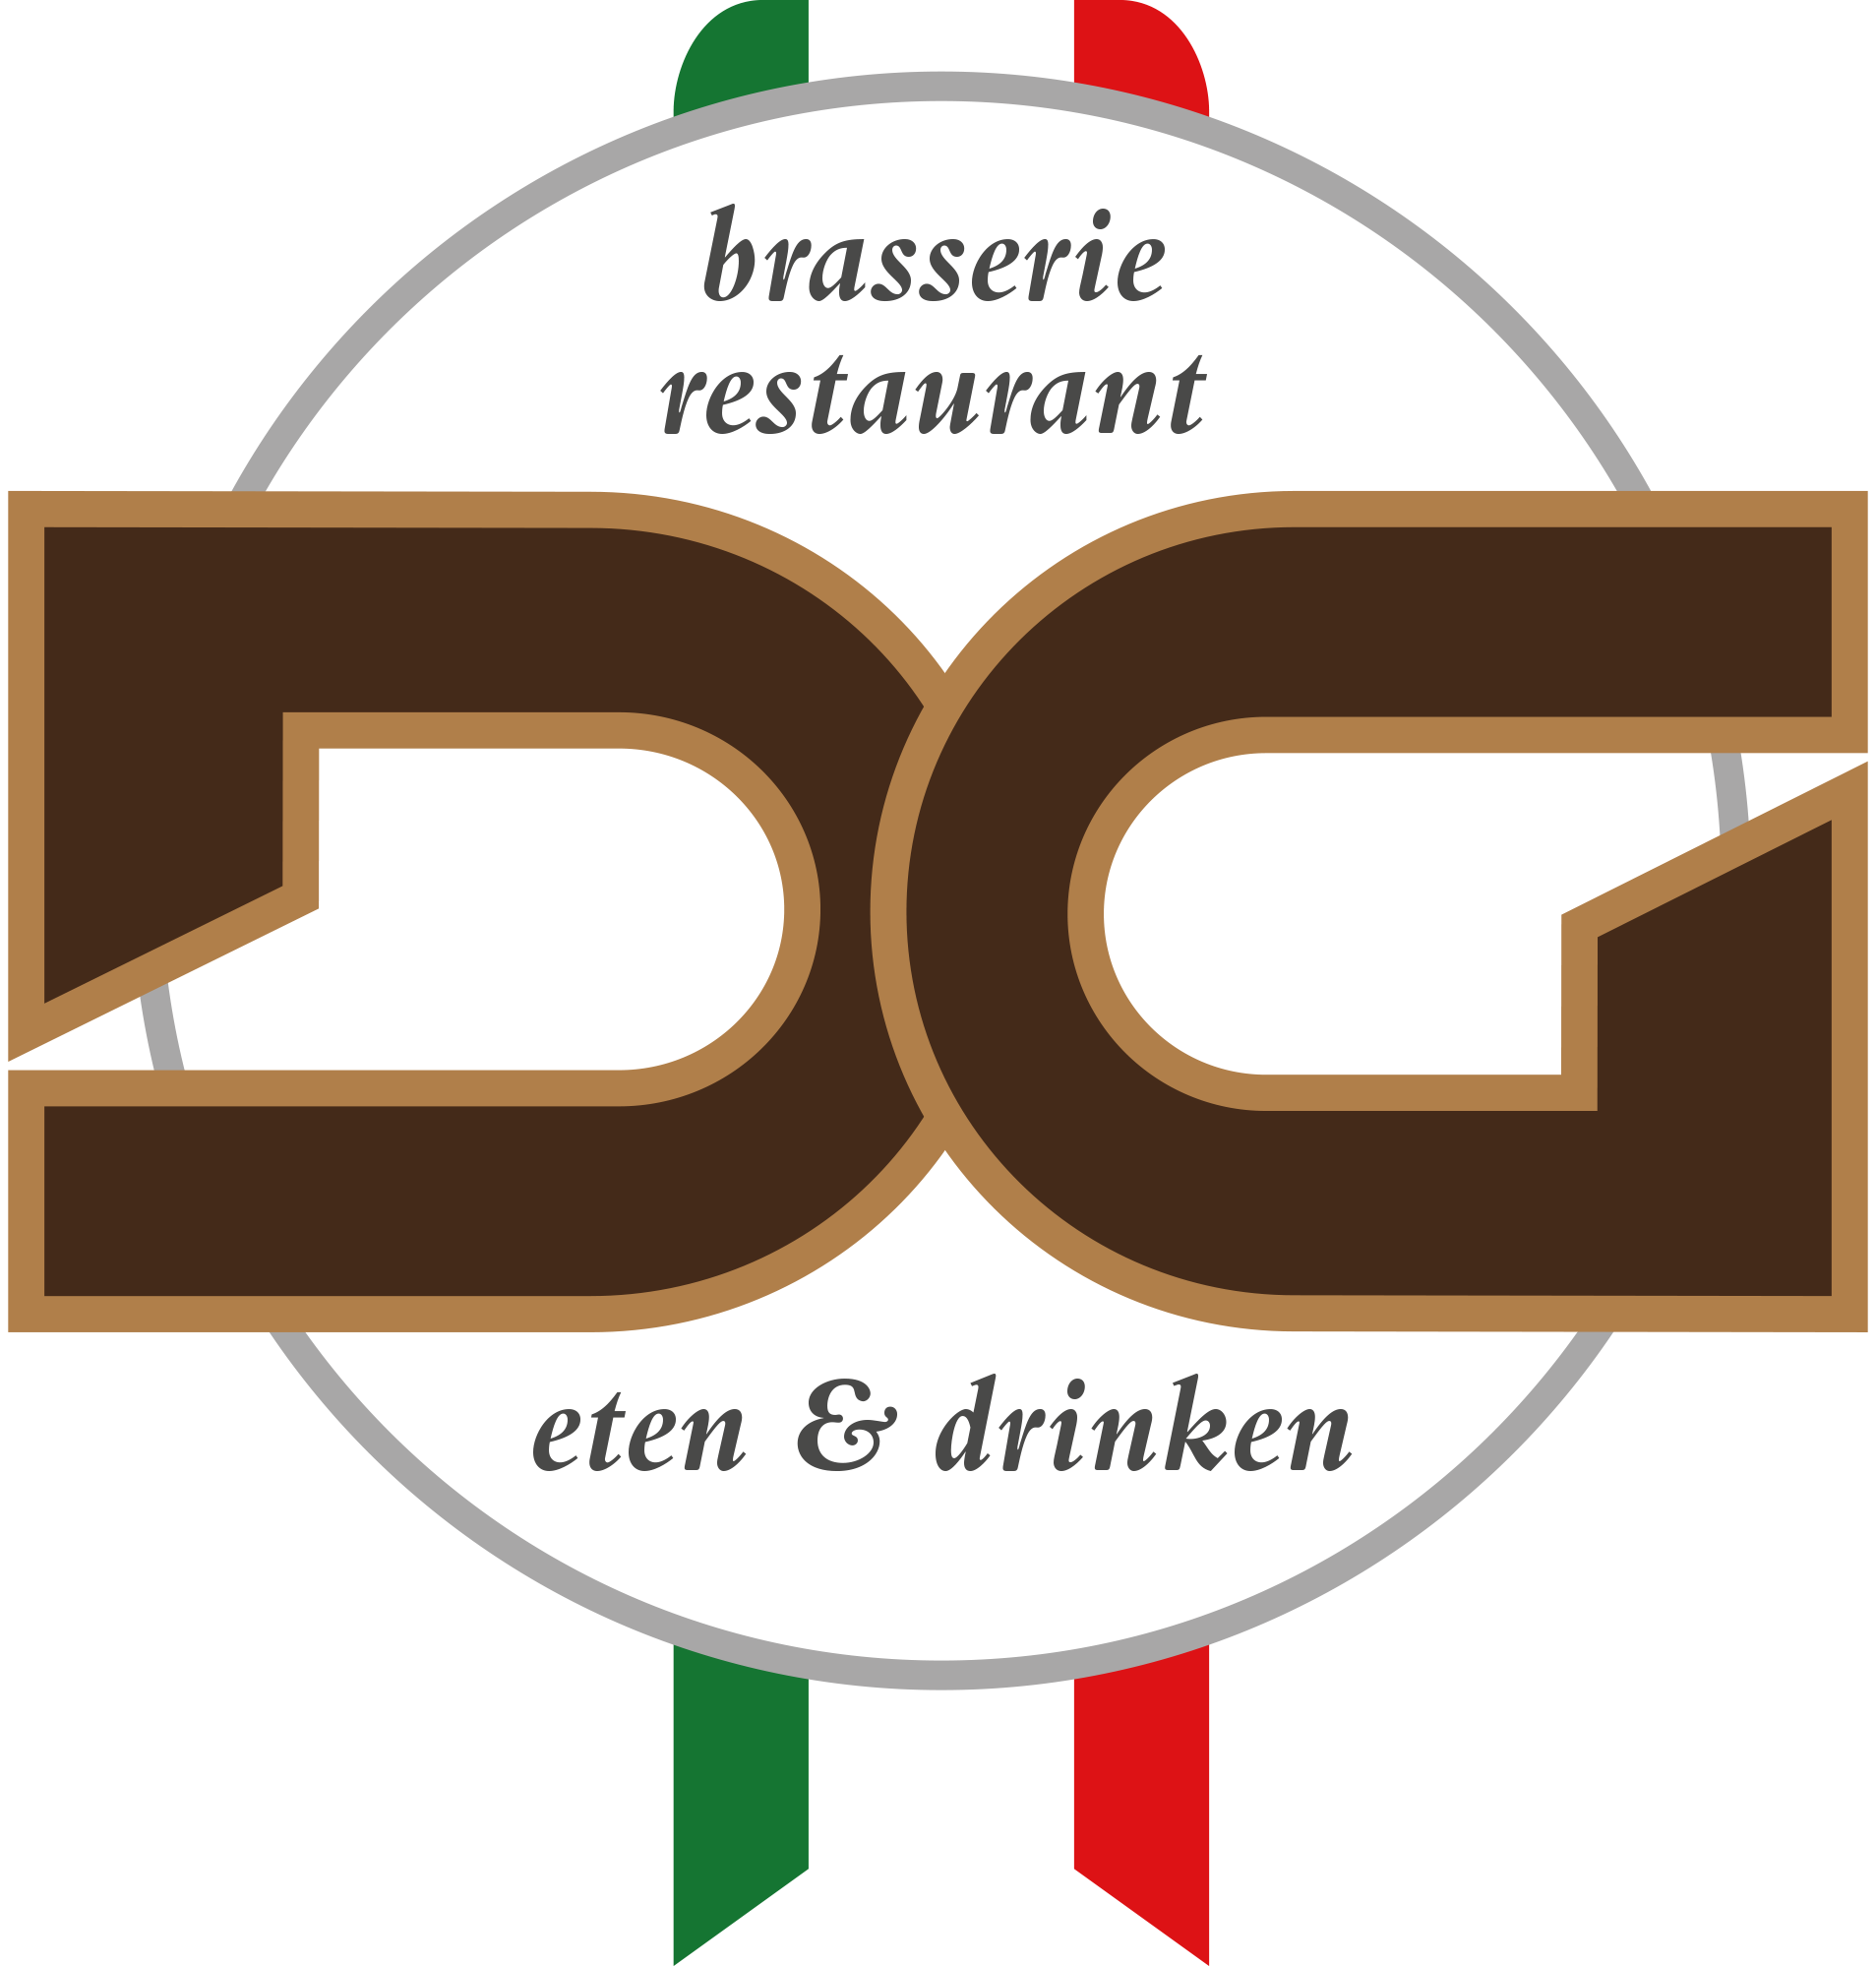 Don Giovanni Italiaans brasserie/restaurant | Vlissingen